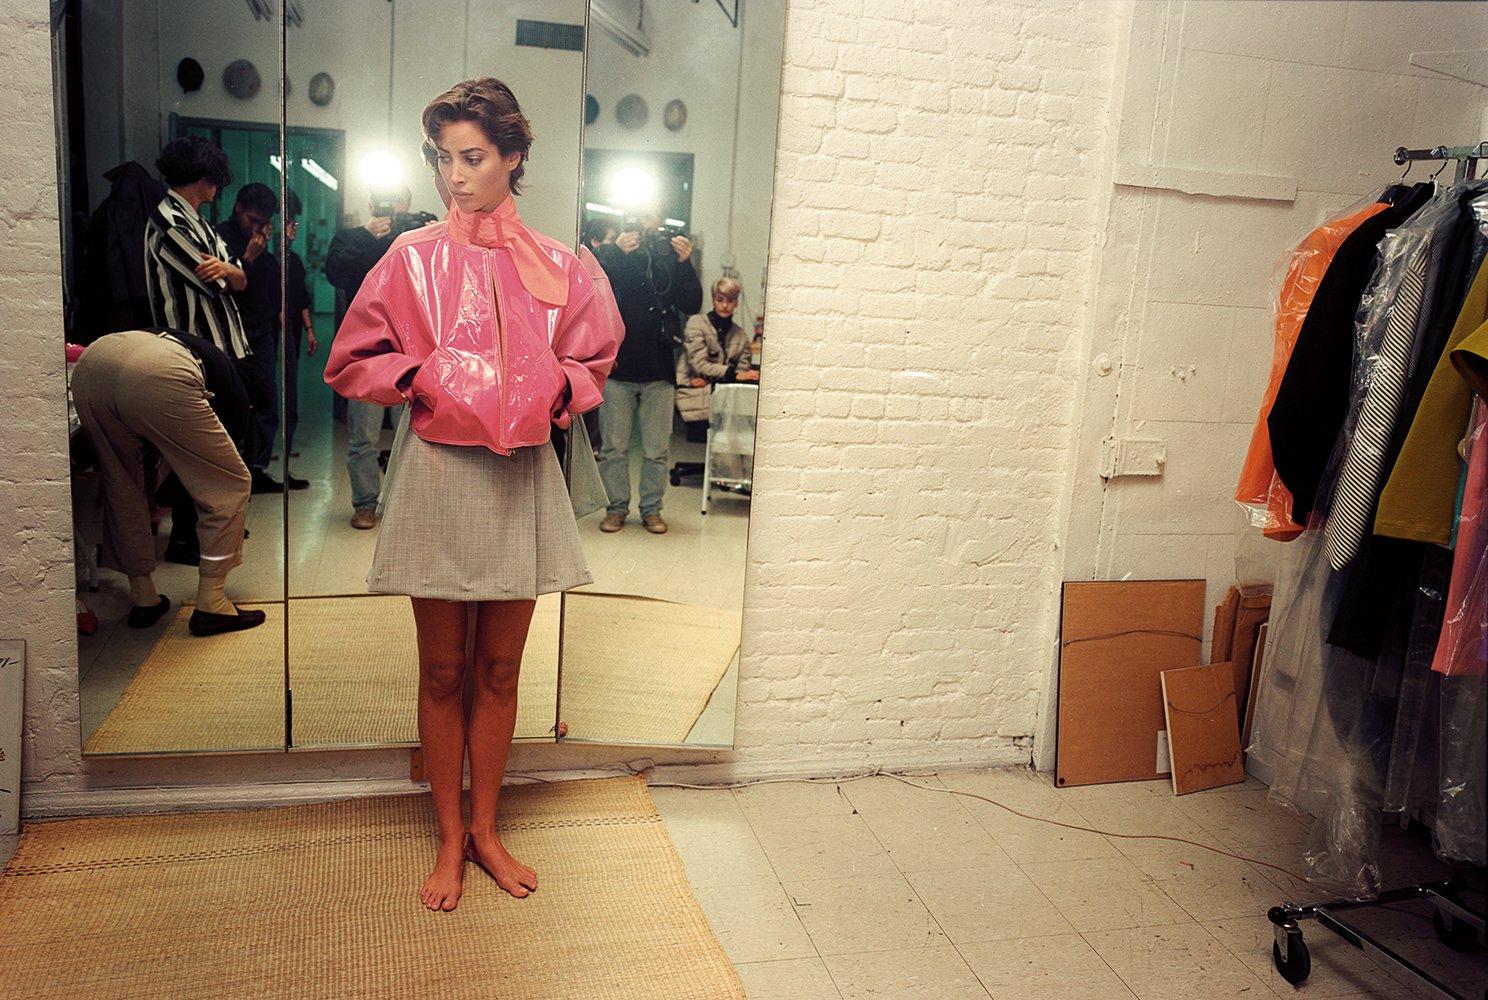 Amazon The Isaac Mizrahi Pictures New York City 1989 1993 Photographs By Nick Waplington 9788862084512 Books